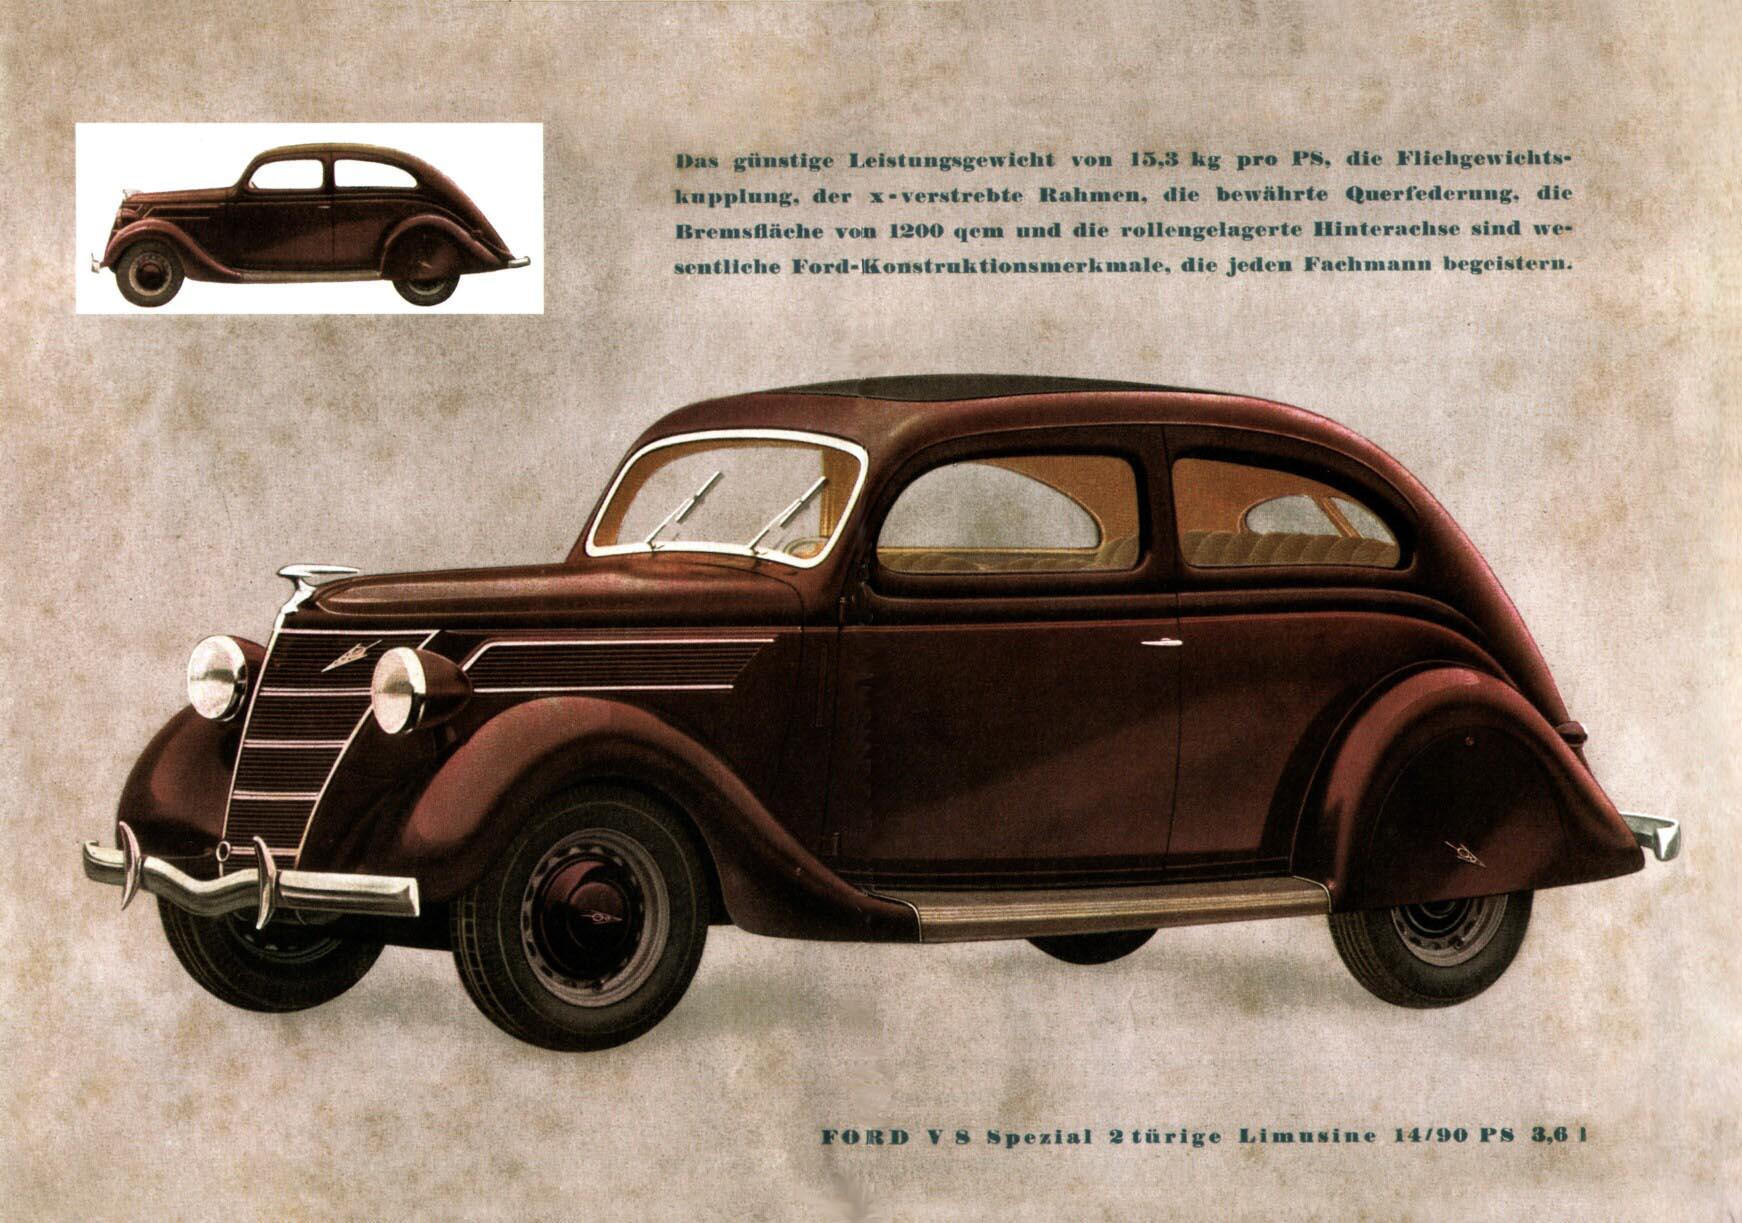 1938 Ford V8 Brochure